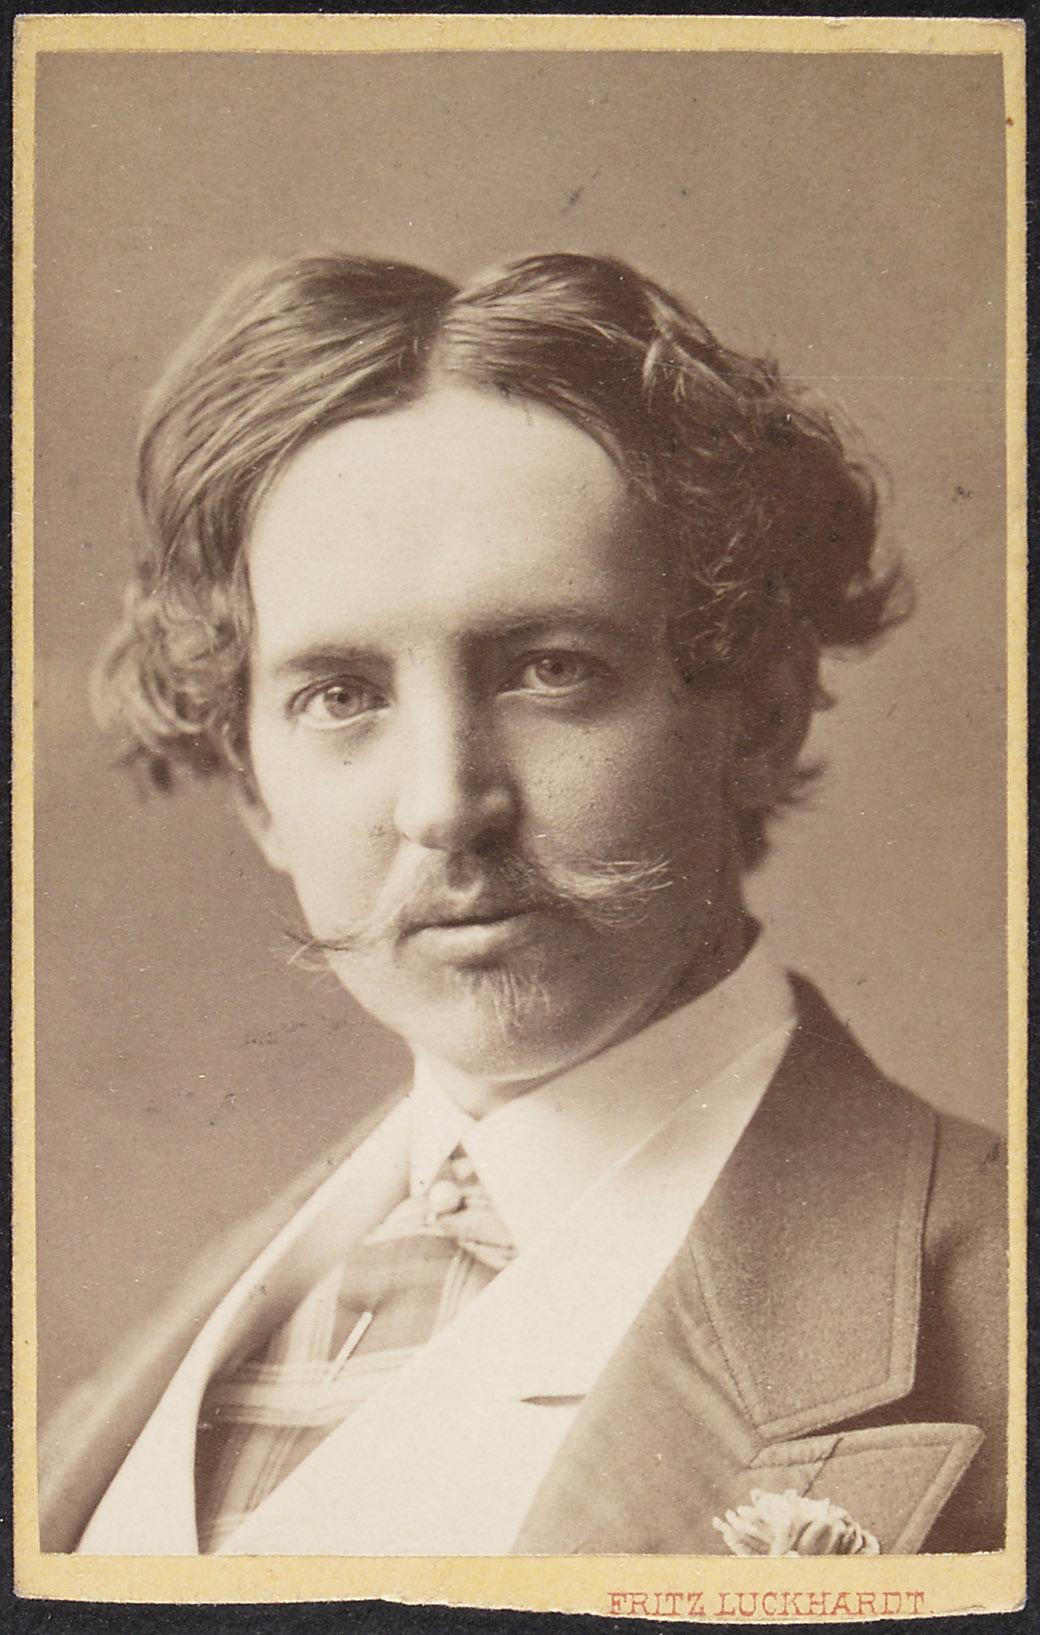 Arthur Seymour Sullivan von Fritz Luckhardt, Wien